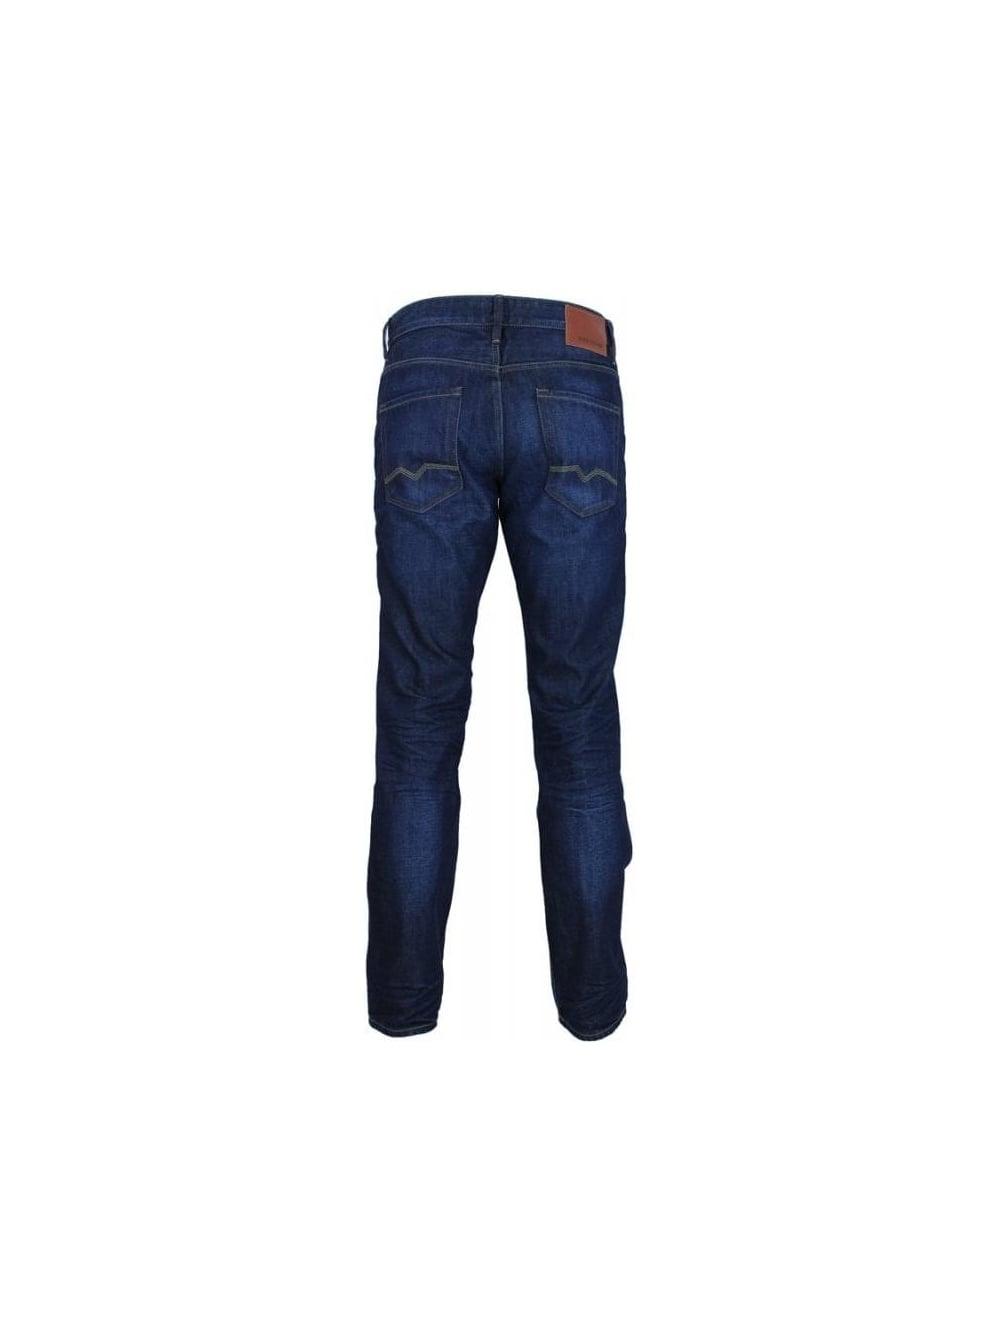 hugo boss orange 25 moonlight jeans in dark blue northern threads. Black Bedroom Furniture Sets. Home Design Ideas